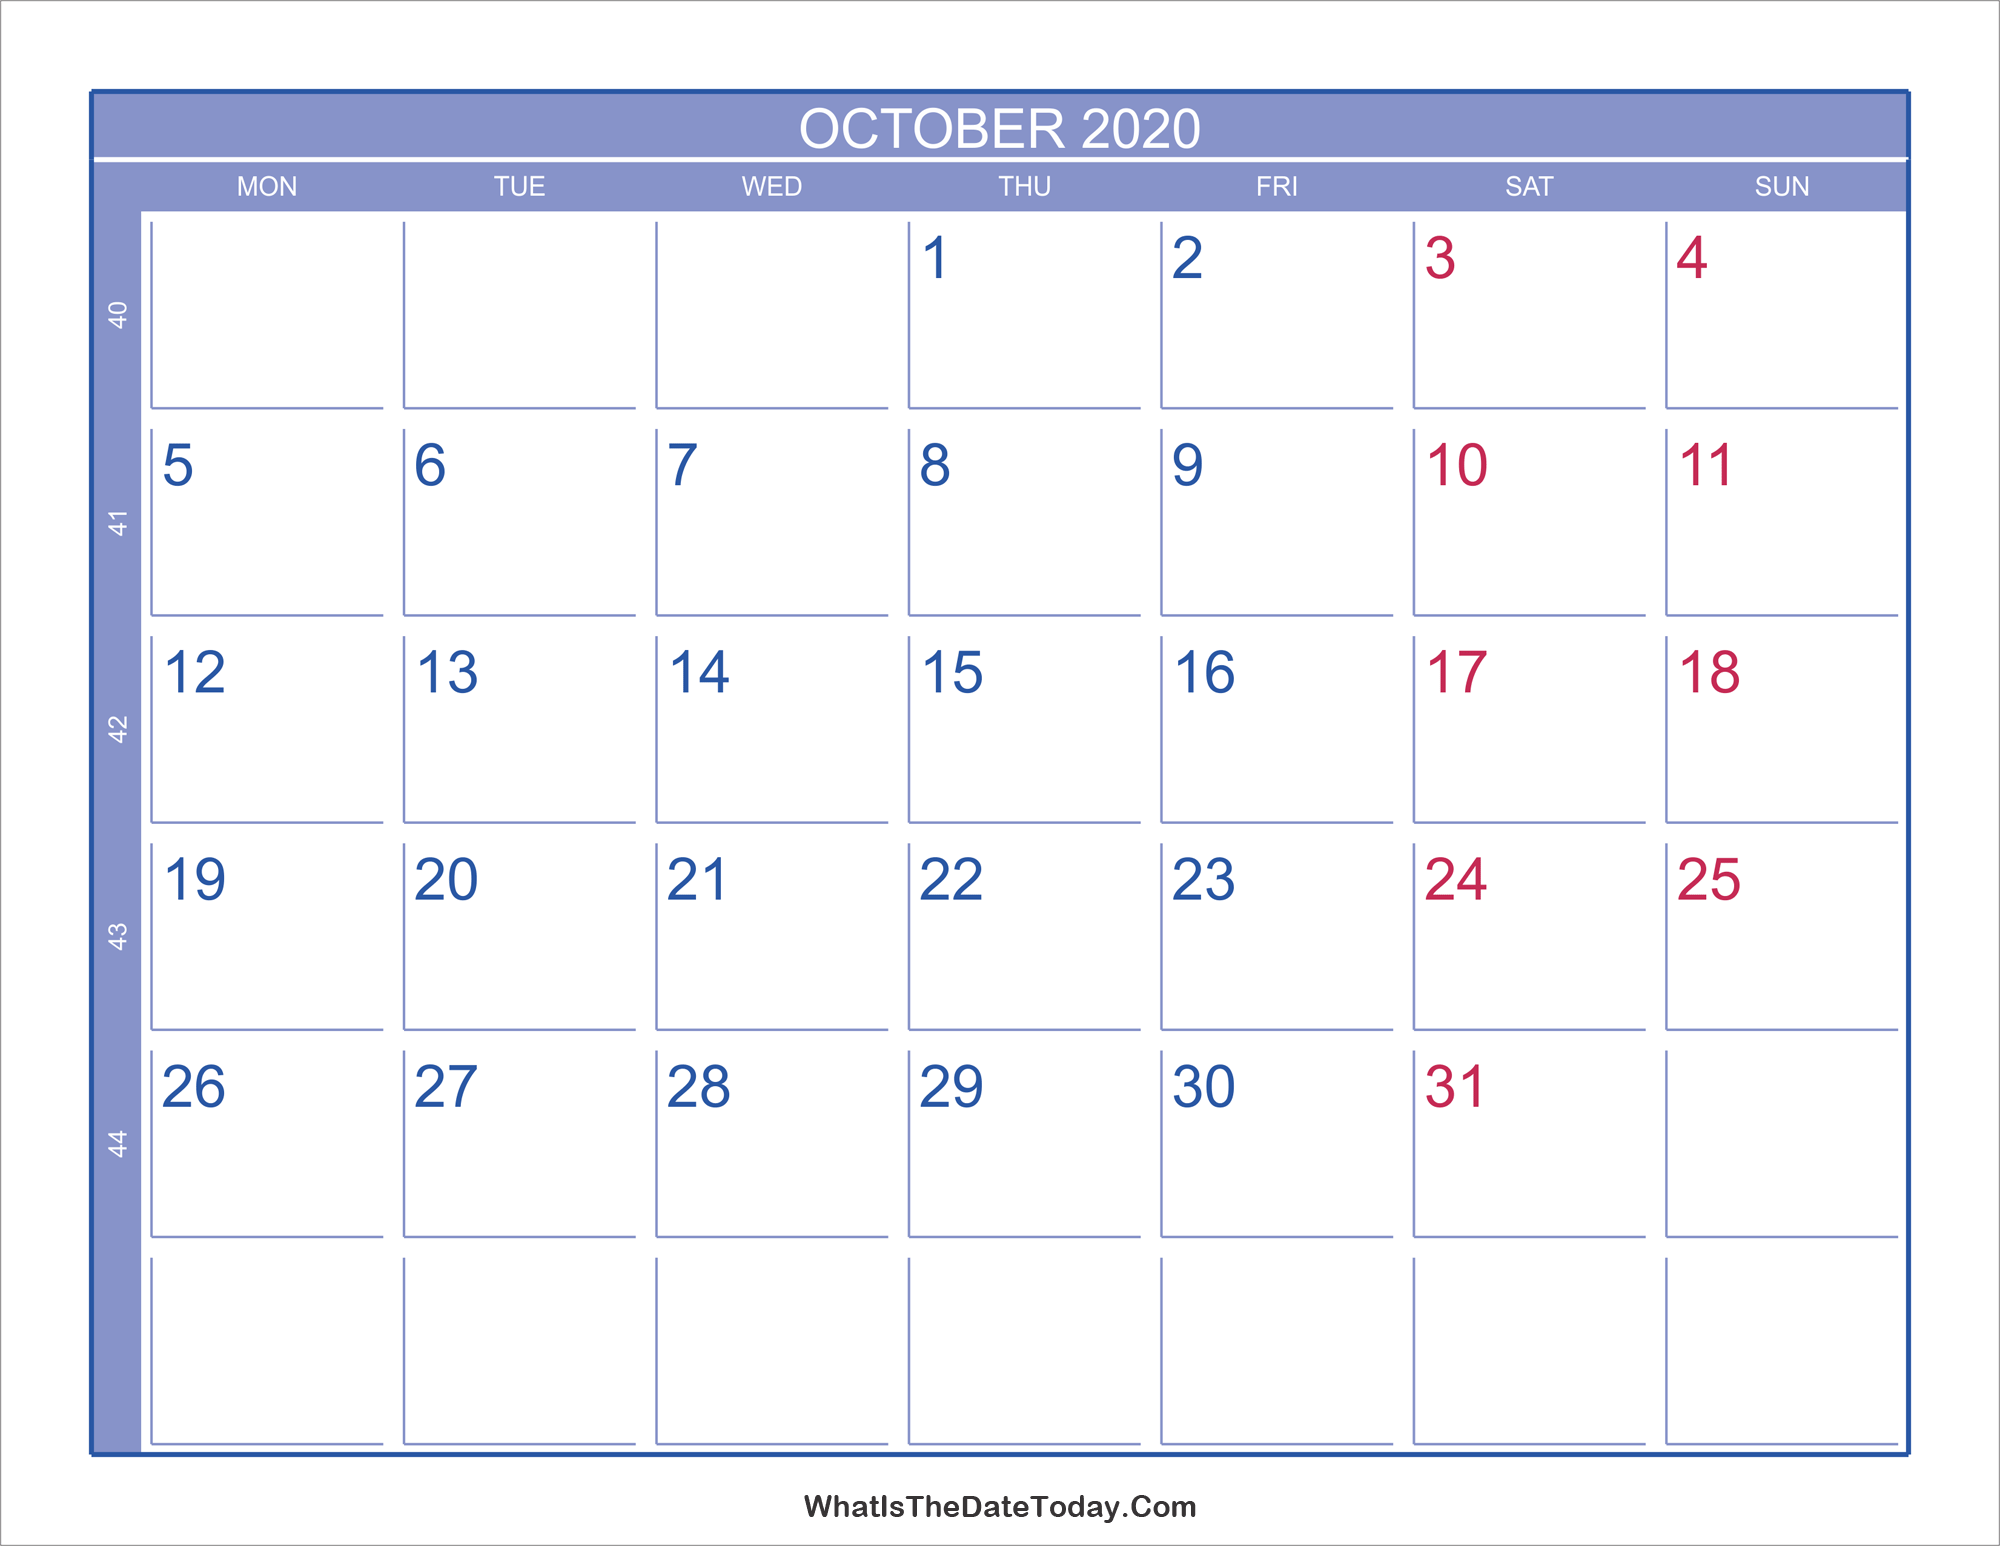 Calendar With Week Numbers 2020.2020 October Calendar With Week Numbers Whatisthedatetoday Com